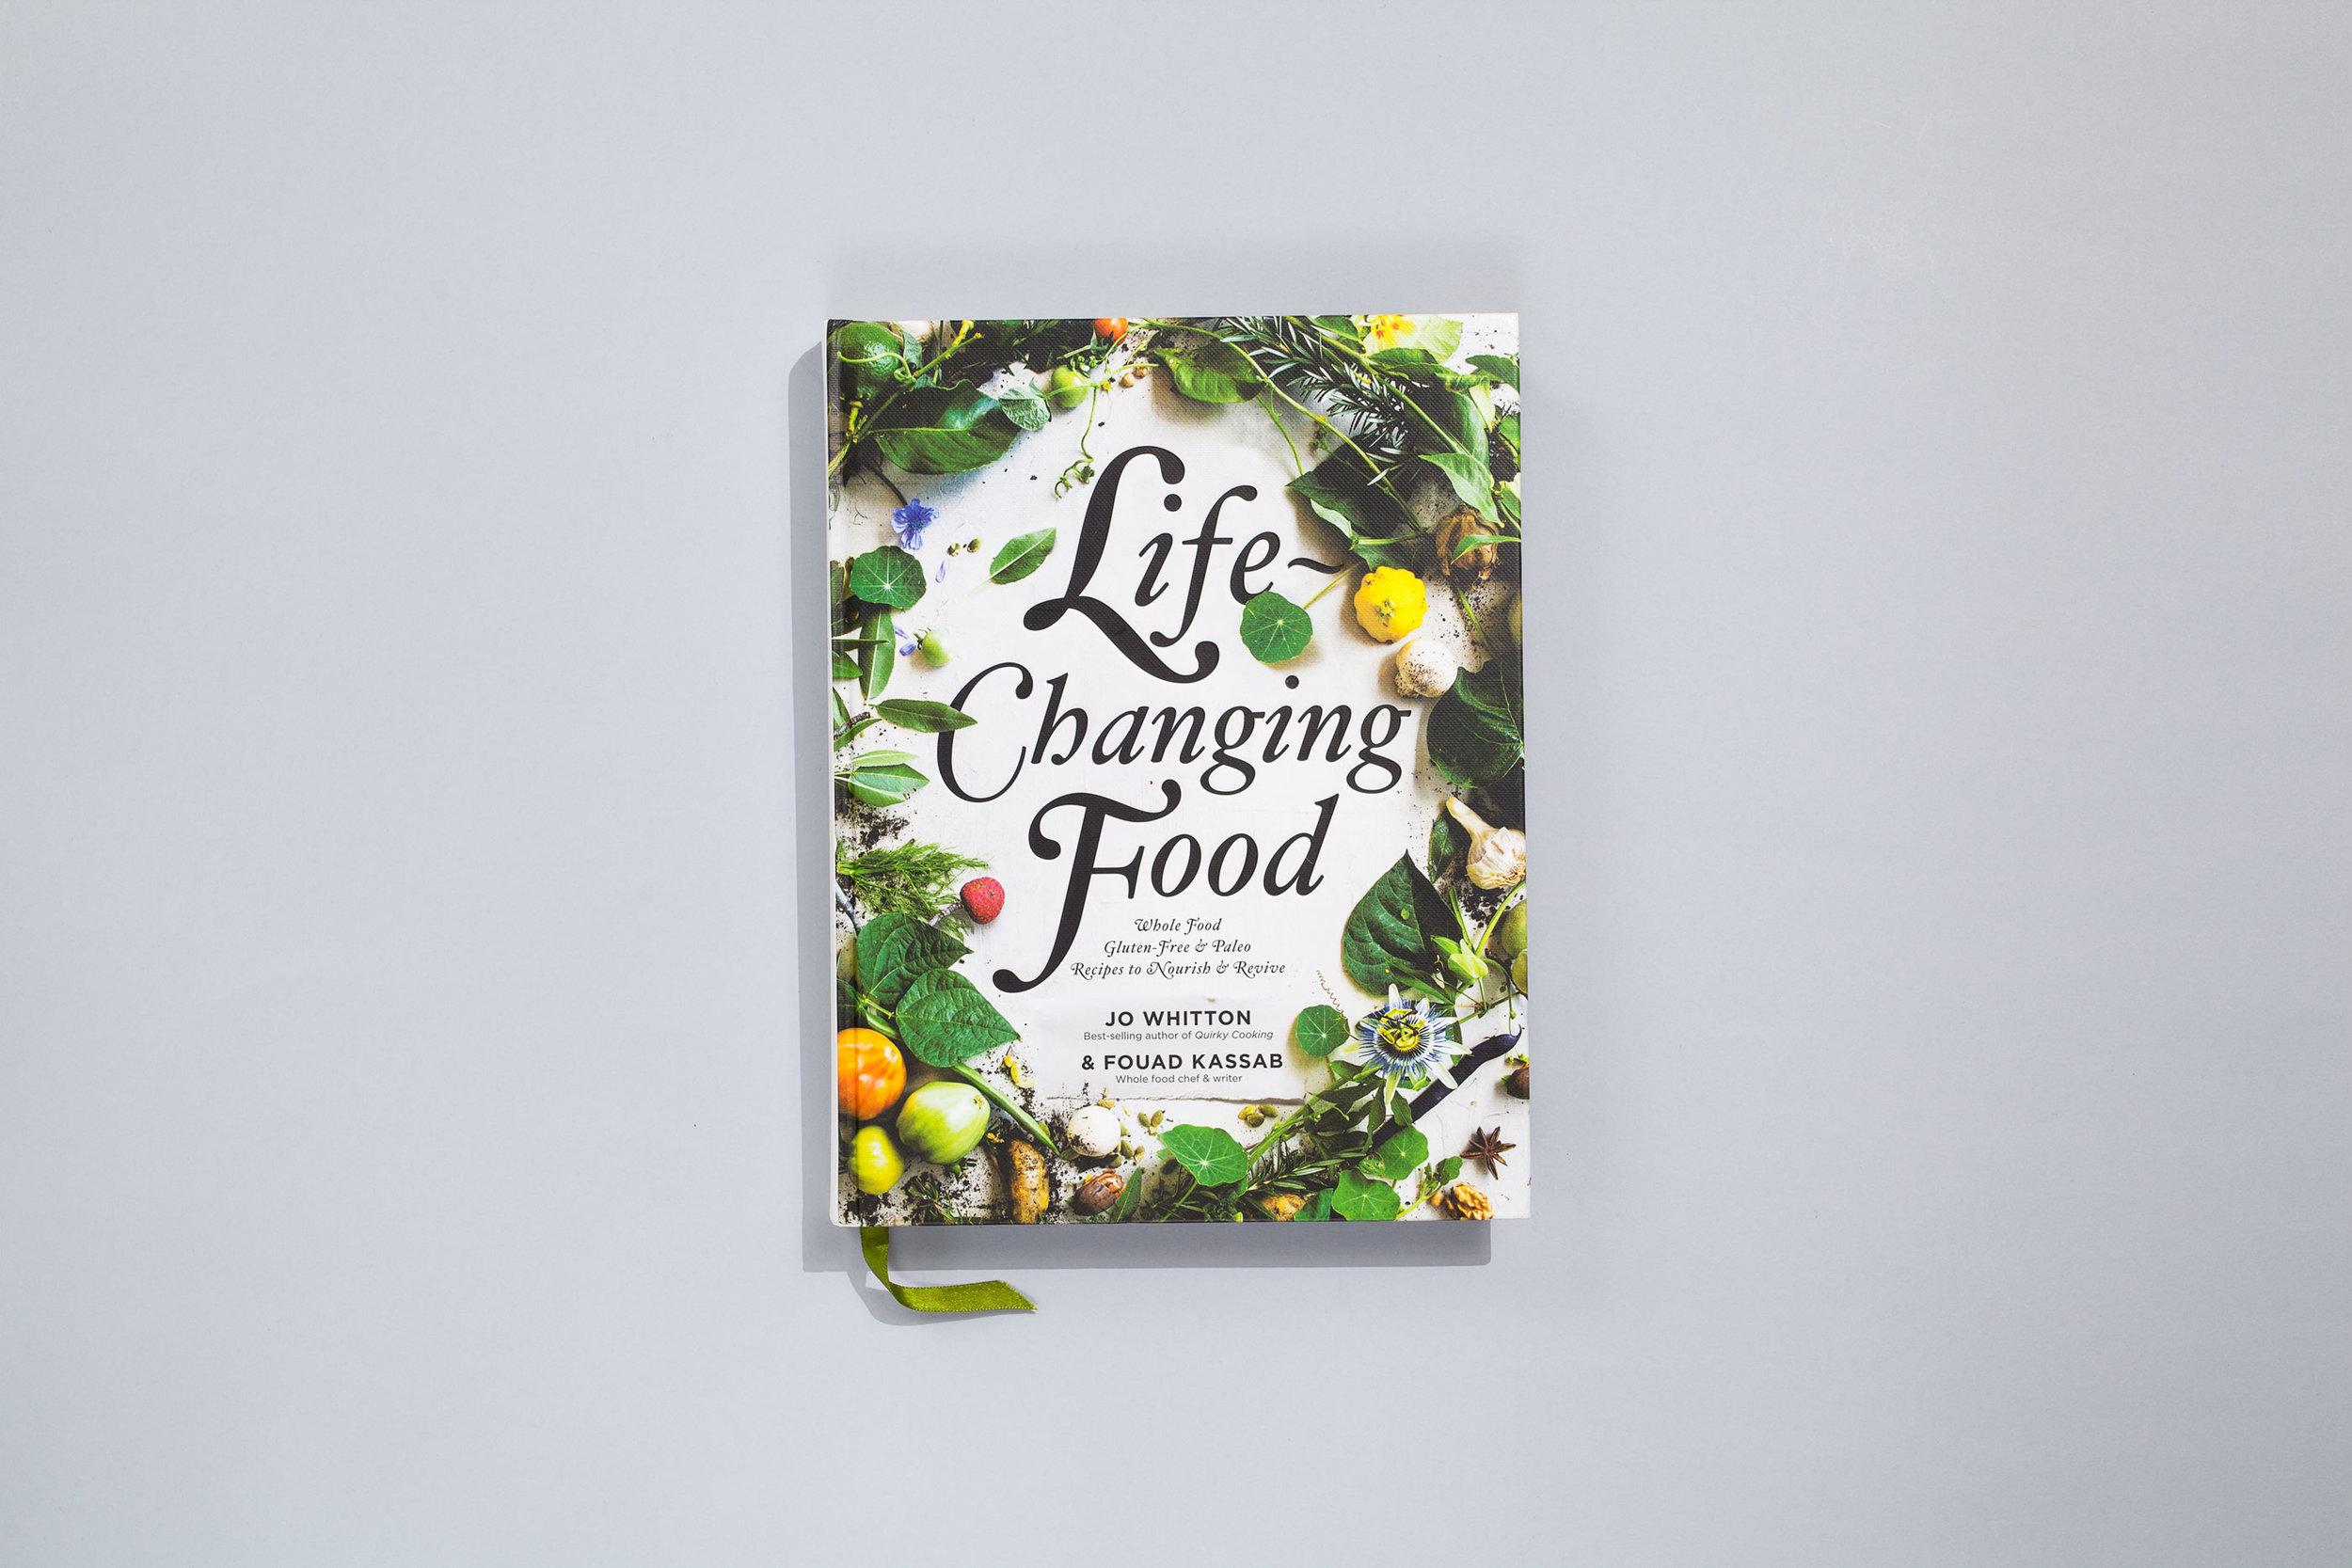 Title – Life Changing Food Authors – Jo Whiten & Fouad Kassab Designer – Daniel New Photographer – Sneh Roy with Luisa Brimble, Hugo Sharp and Fouad Kassab